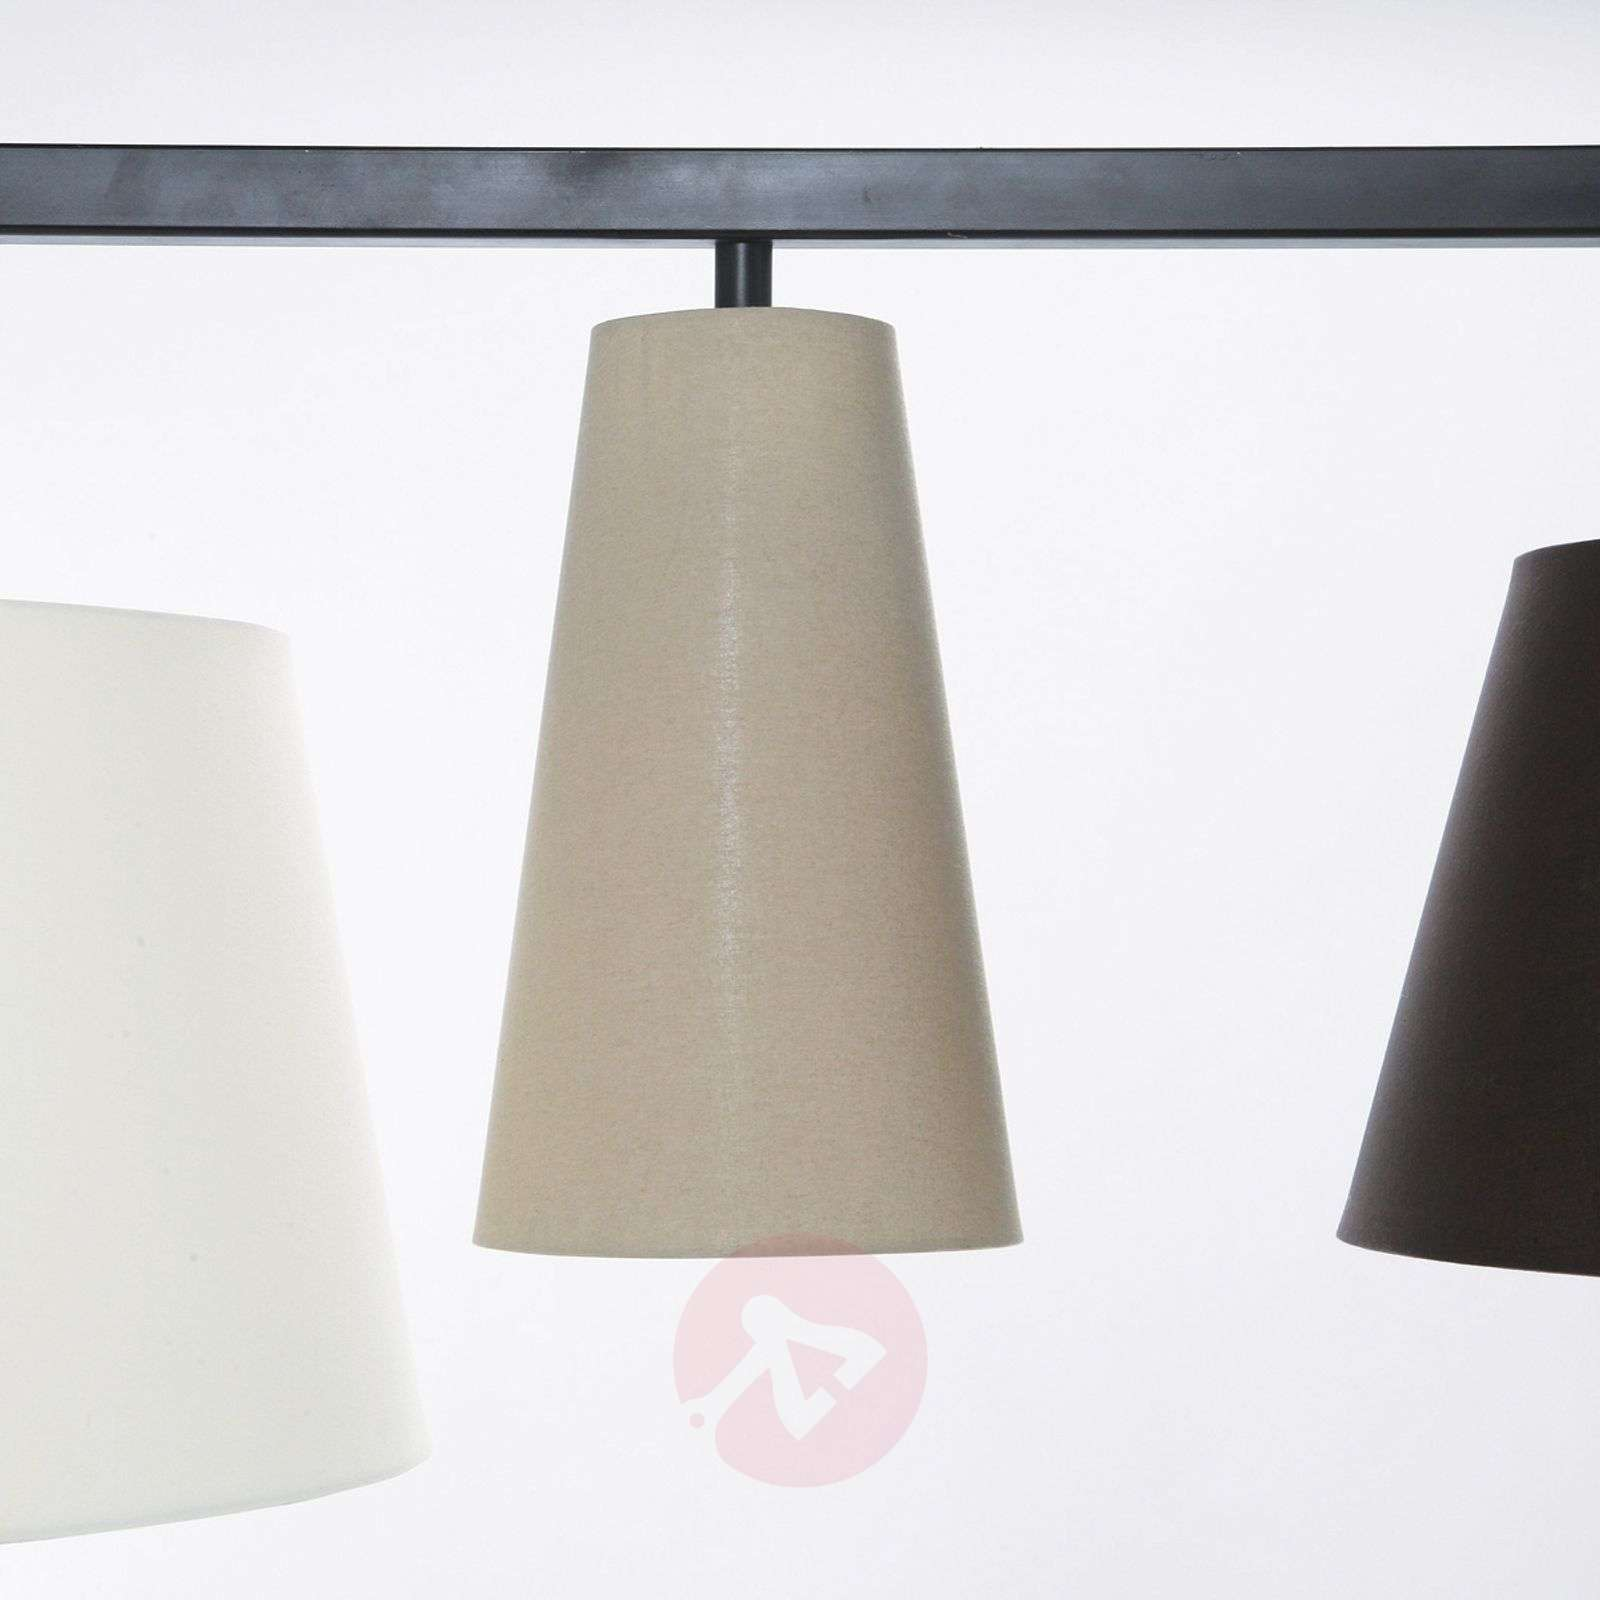 KARE Parecchi black hanging light-5517107-01